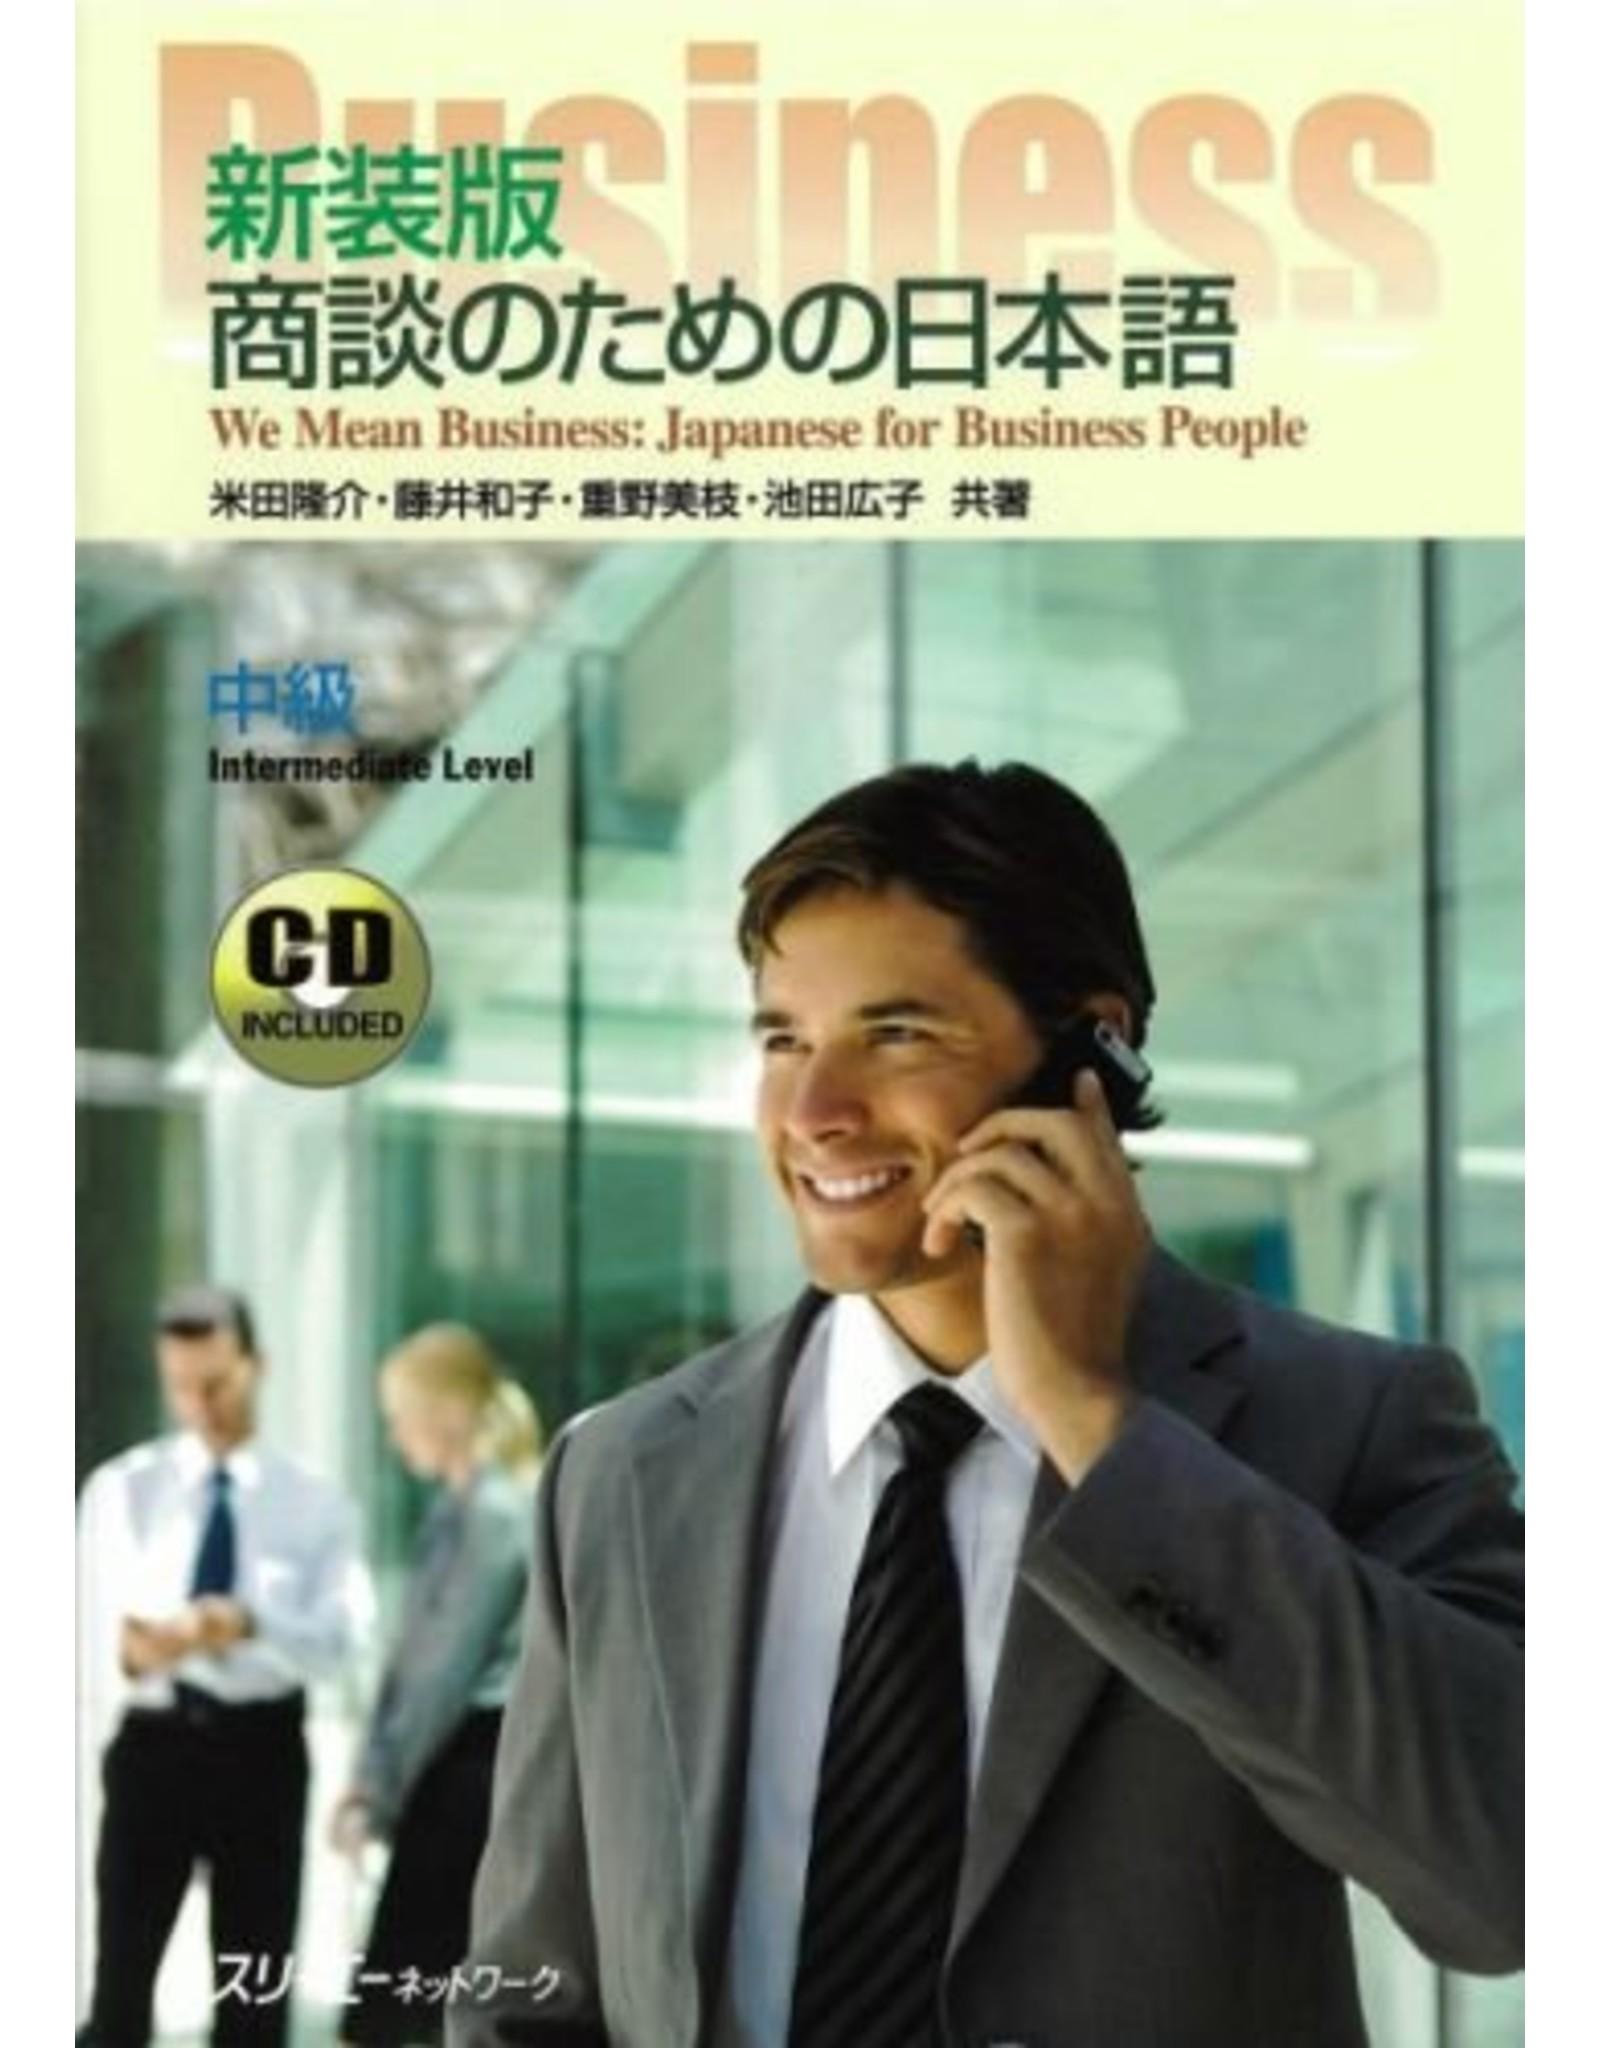 3A Corporation SHODAN NO TEME NO NIHONGO W/CD - WE MEAN BUSINESS W/CD (NEW EDITION)